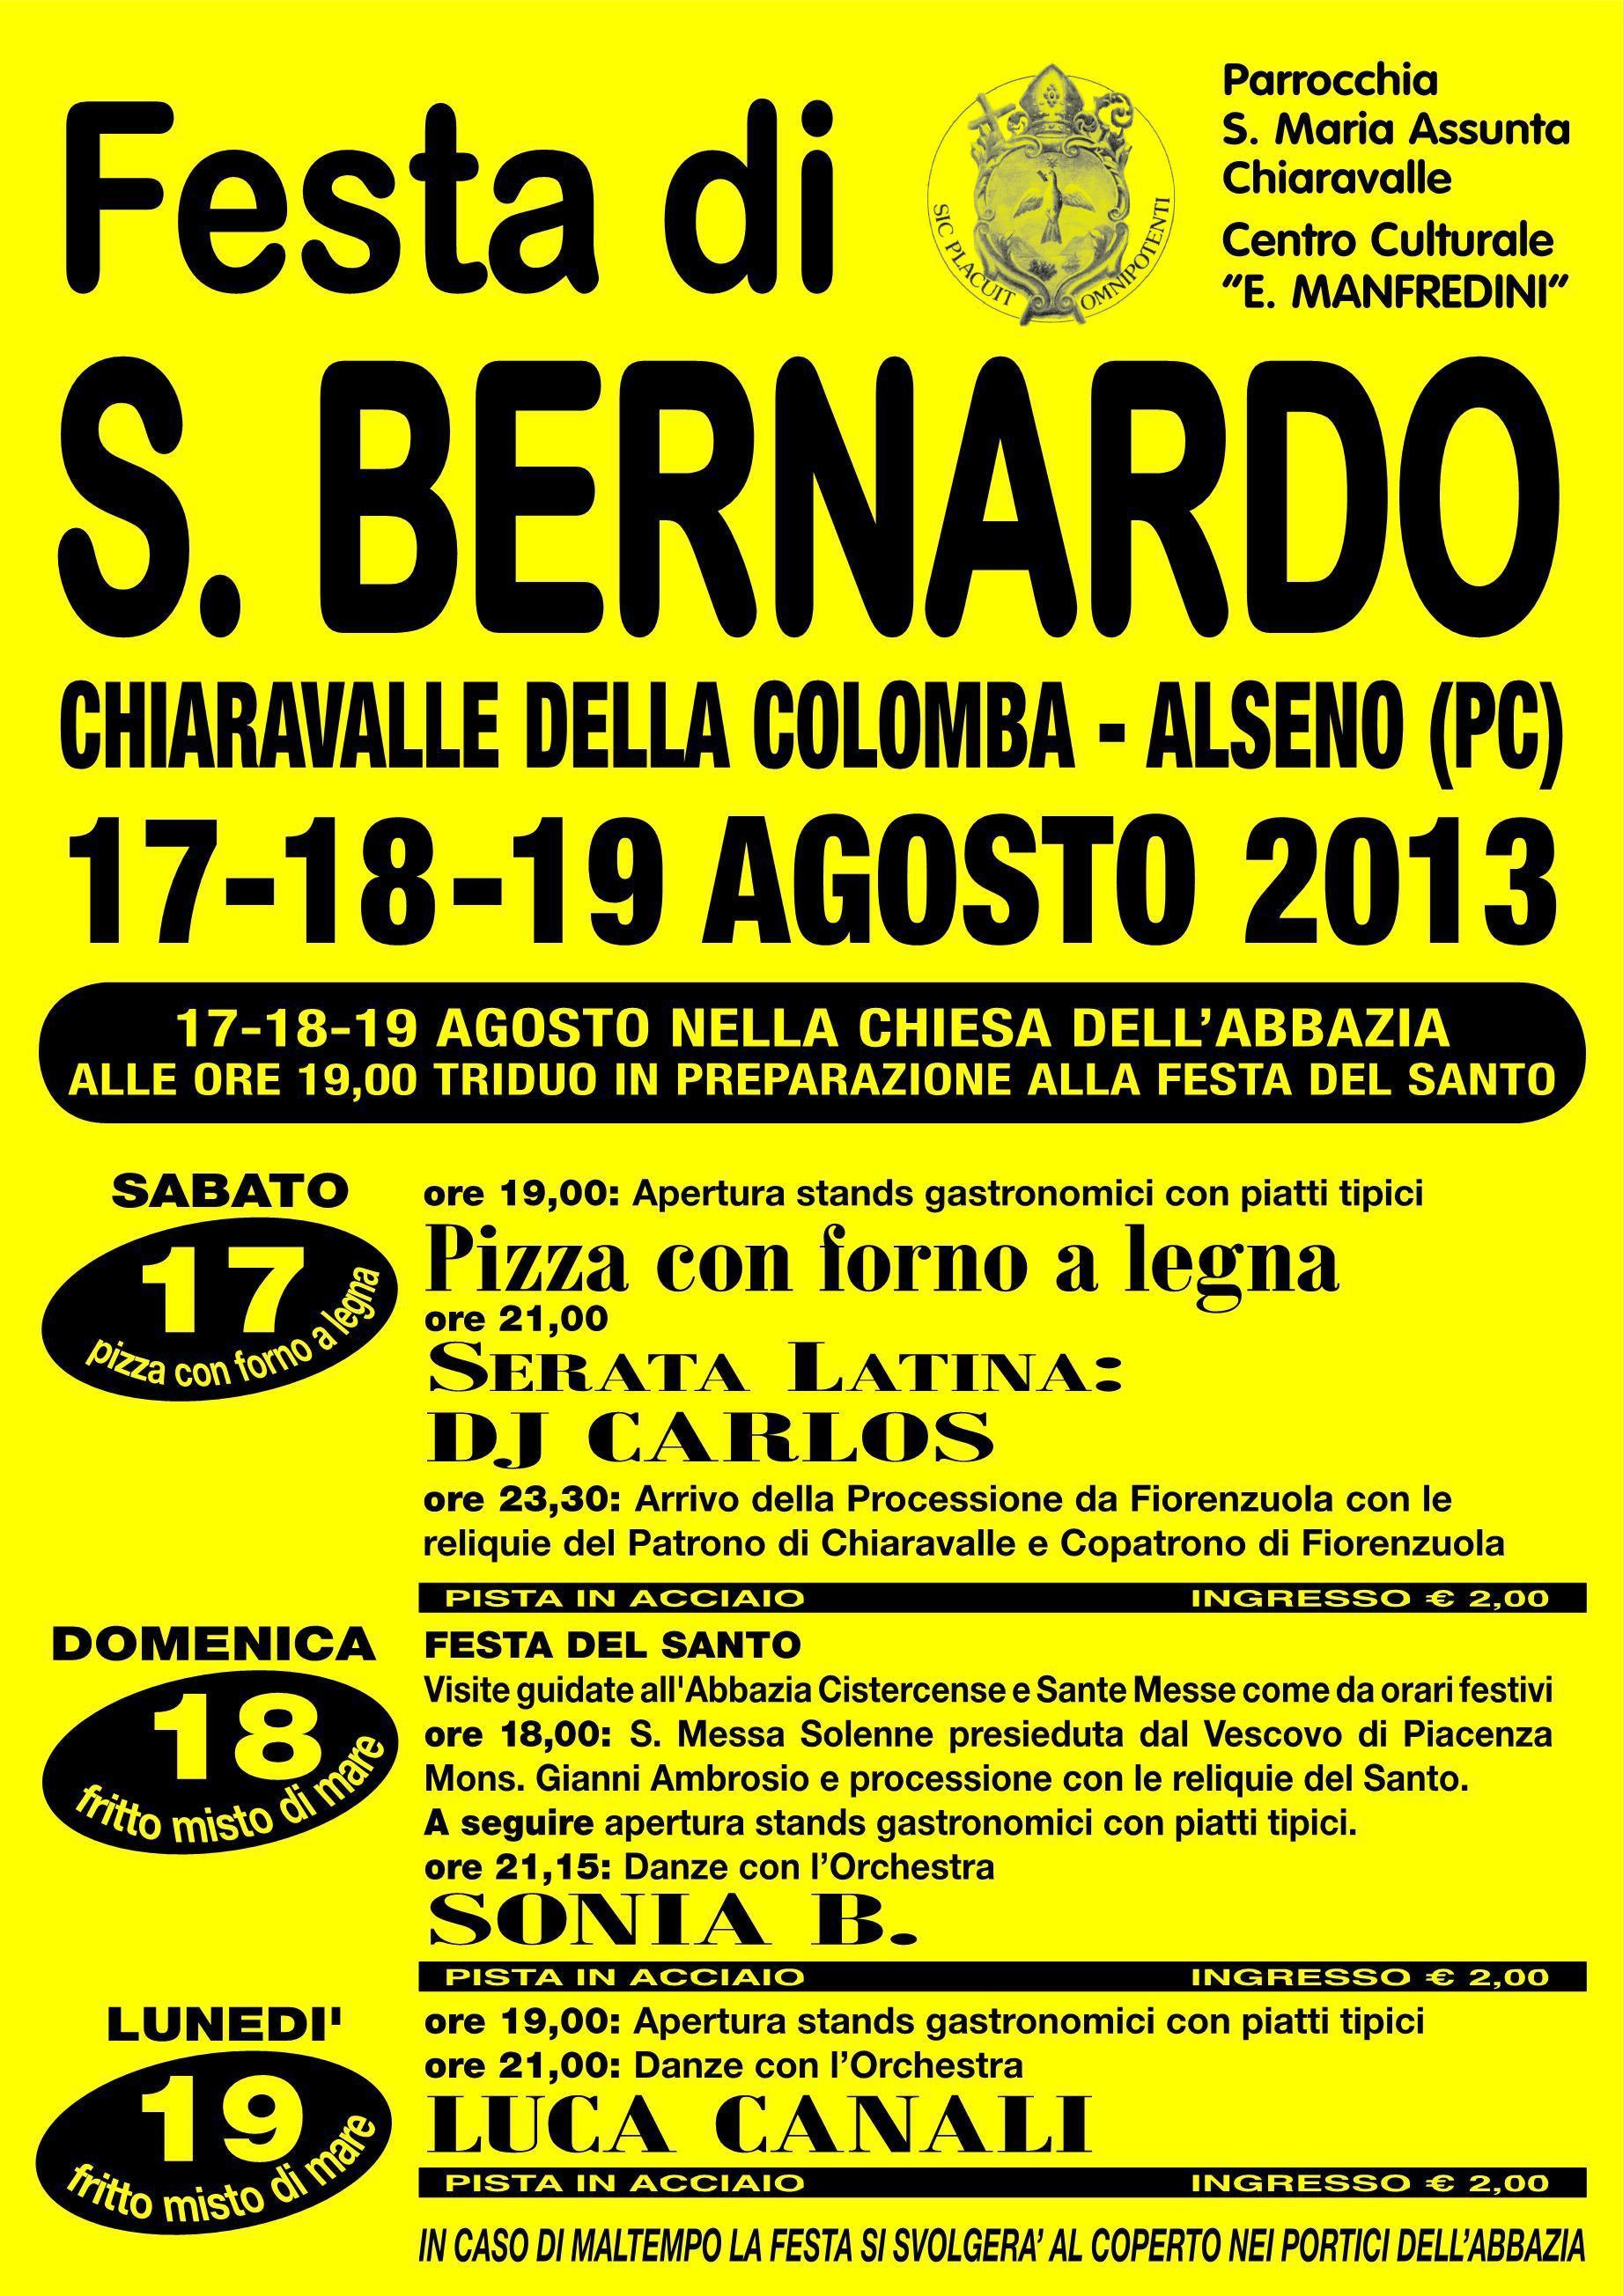 Festa di San Bernardo 2013, dal 17 al 19 agosto ad Alseno (PC) post image